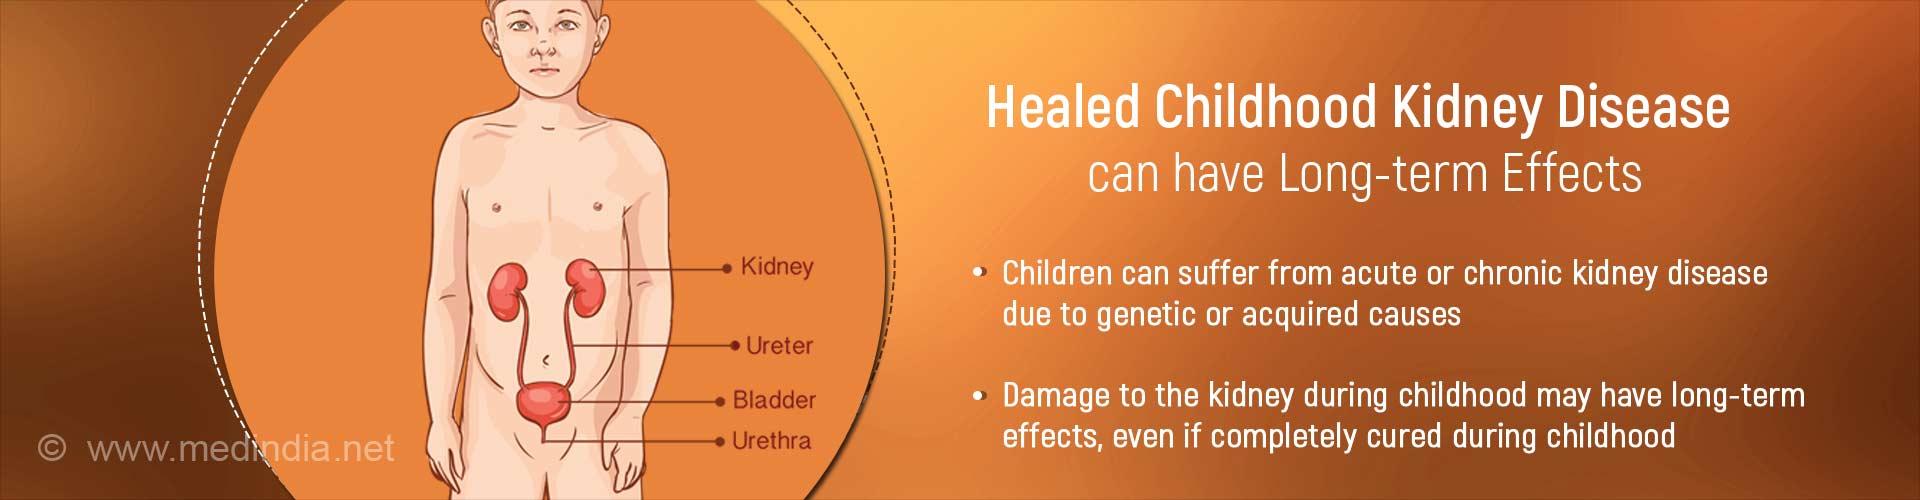 Kidney Disease in Children Increases the Risk of End Stage Renal Disease(ESRD) in Adulthood